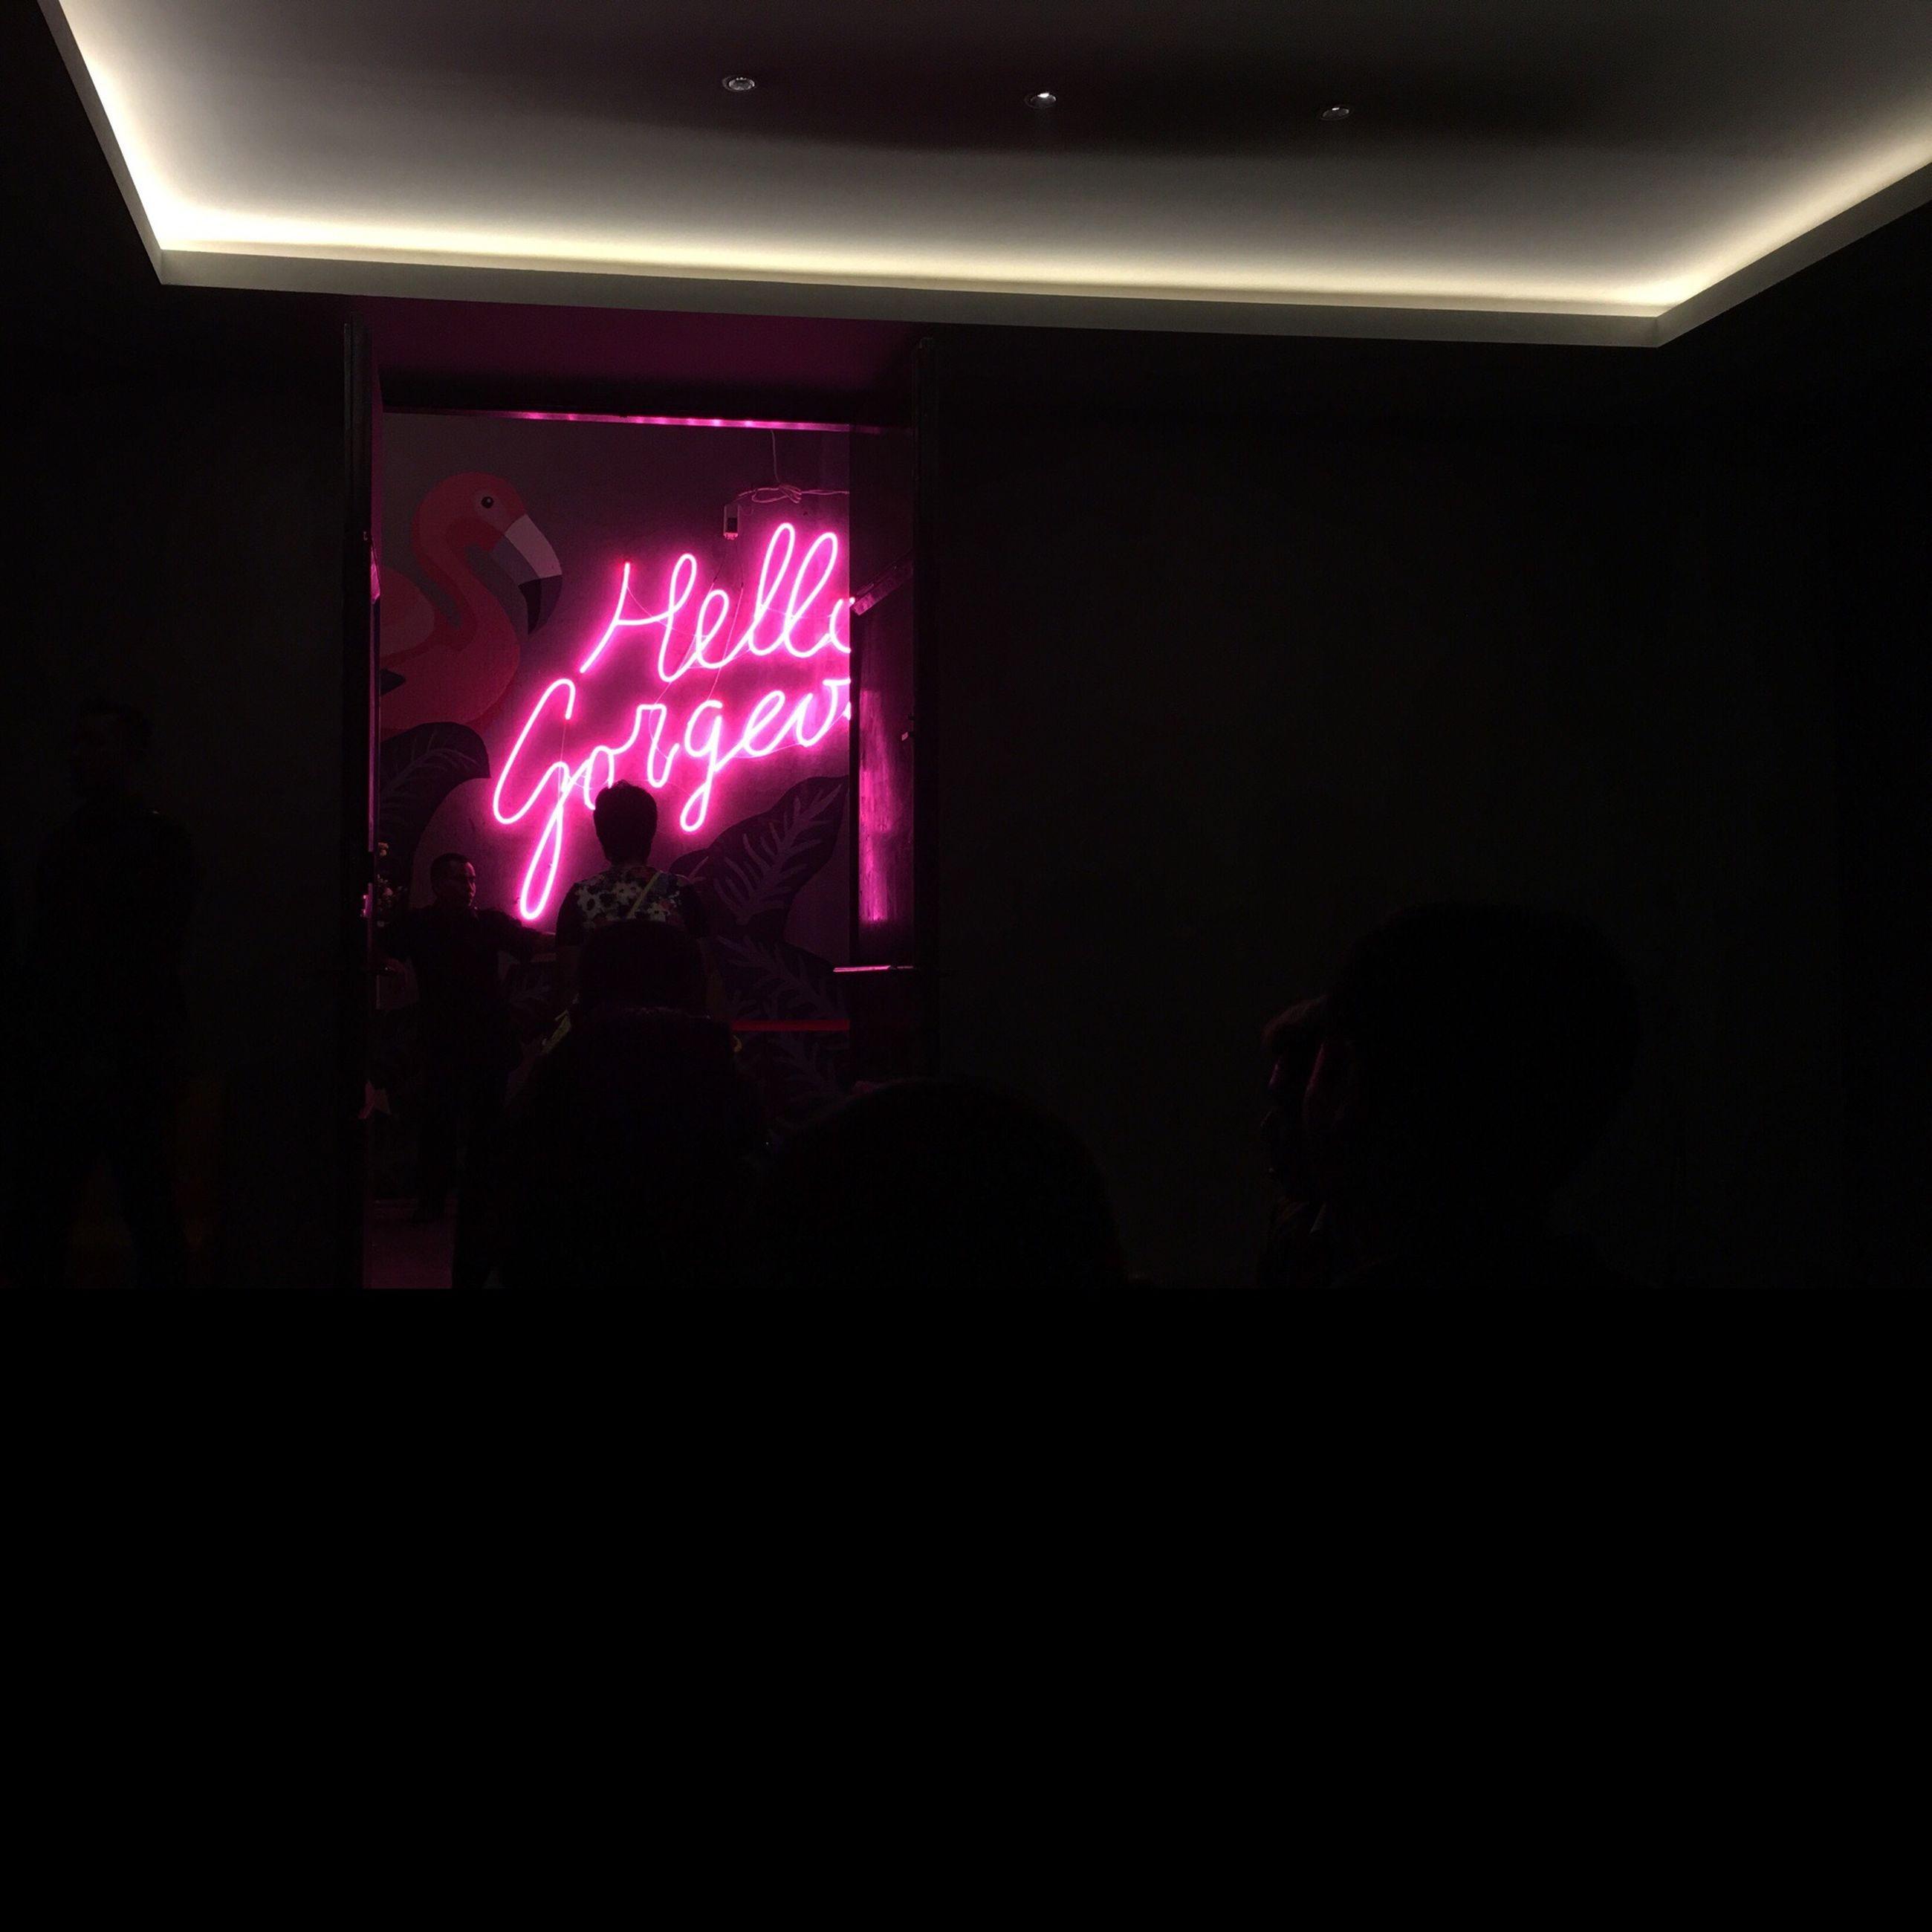 illuminated, lighting equipment, silhouette, hanging, indoors, neon, decoration, night, dark, electric light, light, hanging light, nightlife, event, decorated, darkroom